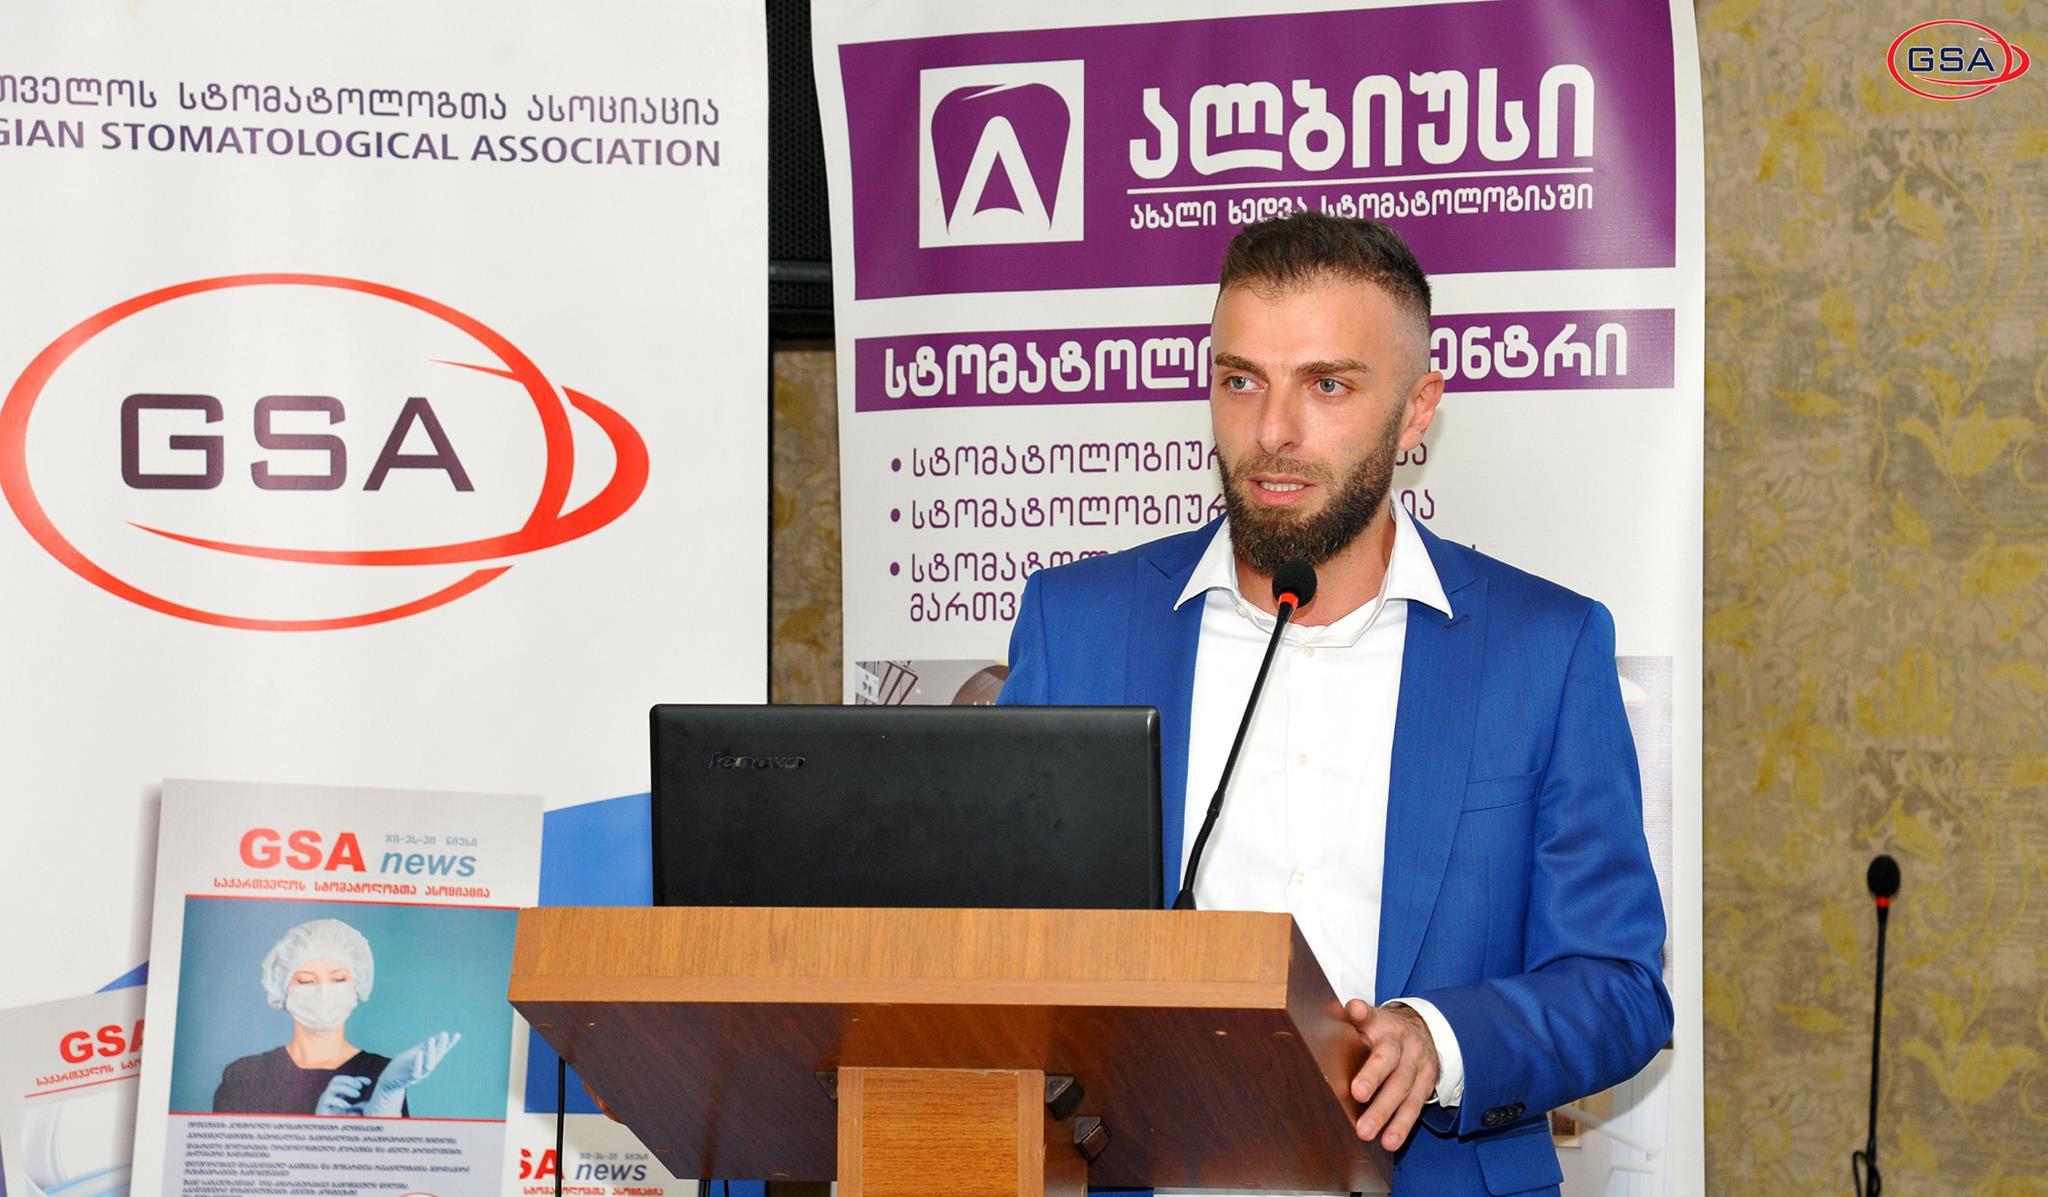 Zurab Alkhanishvili